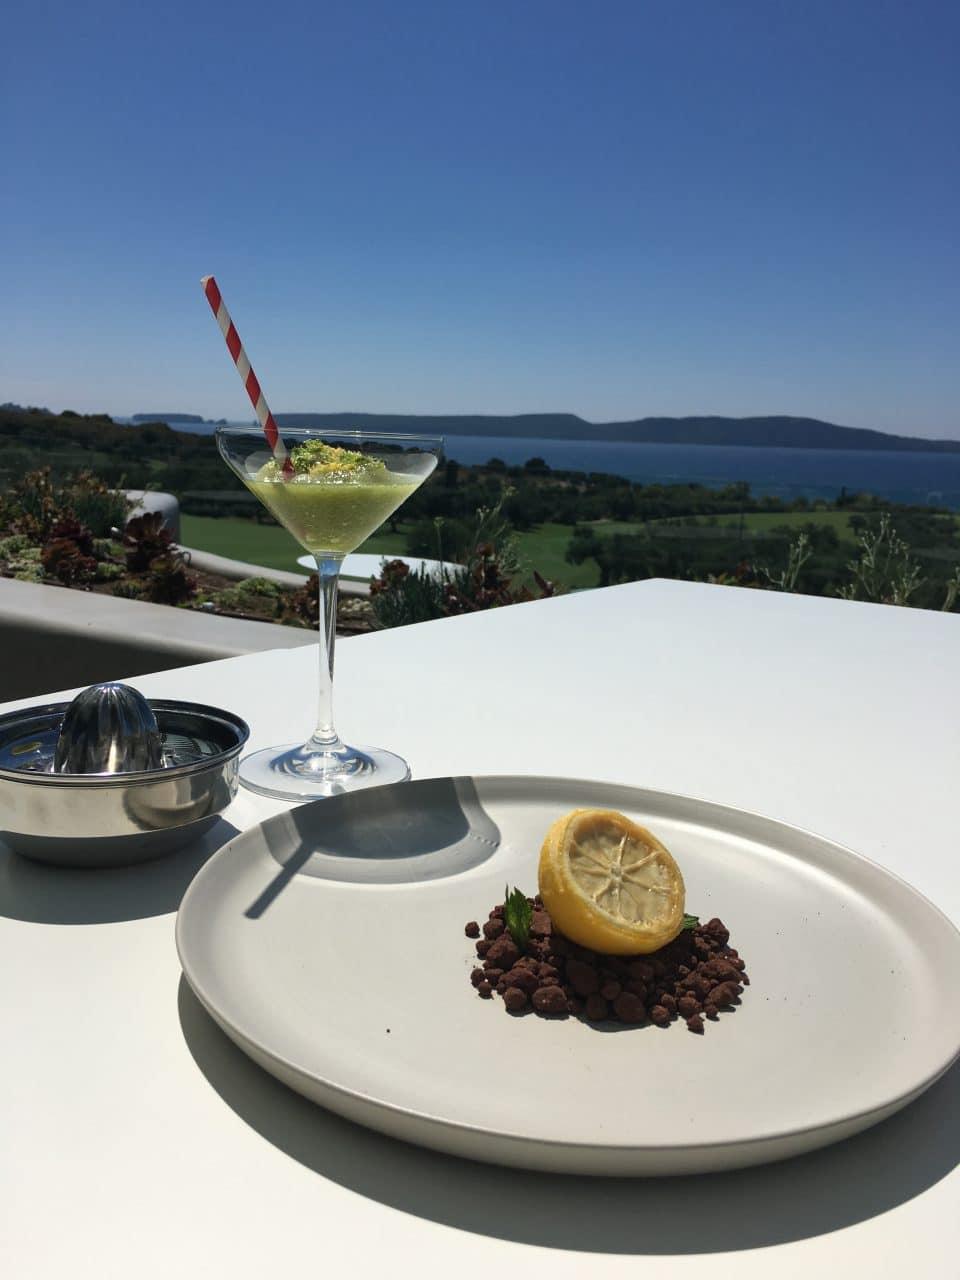 Lemon Dessert by Chef Manolis Stithos